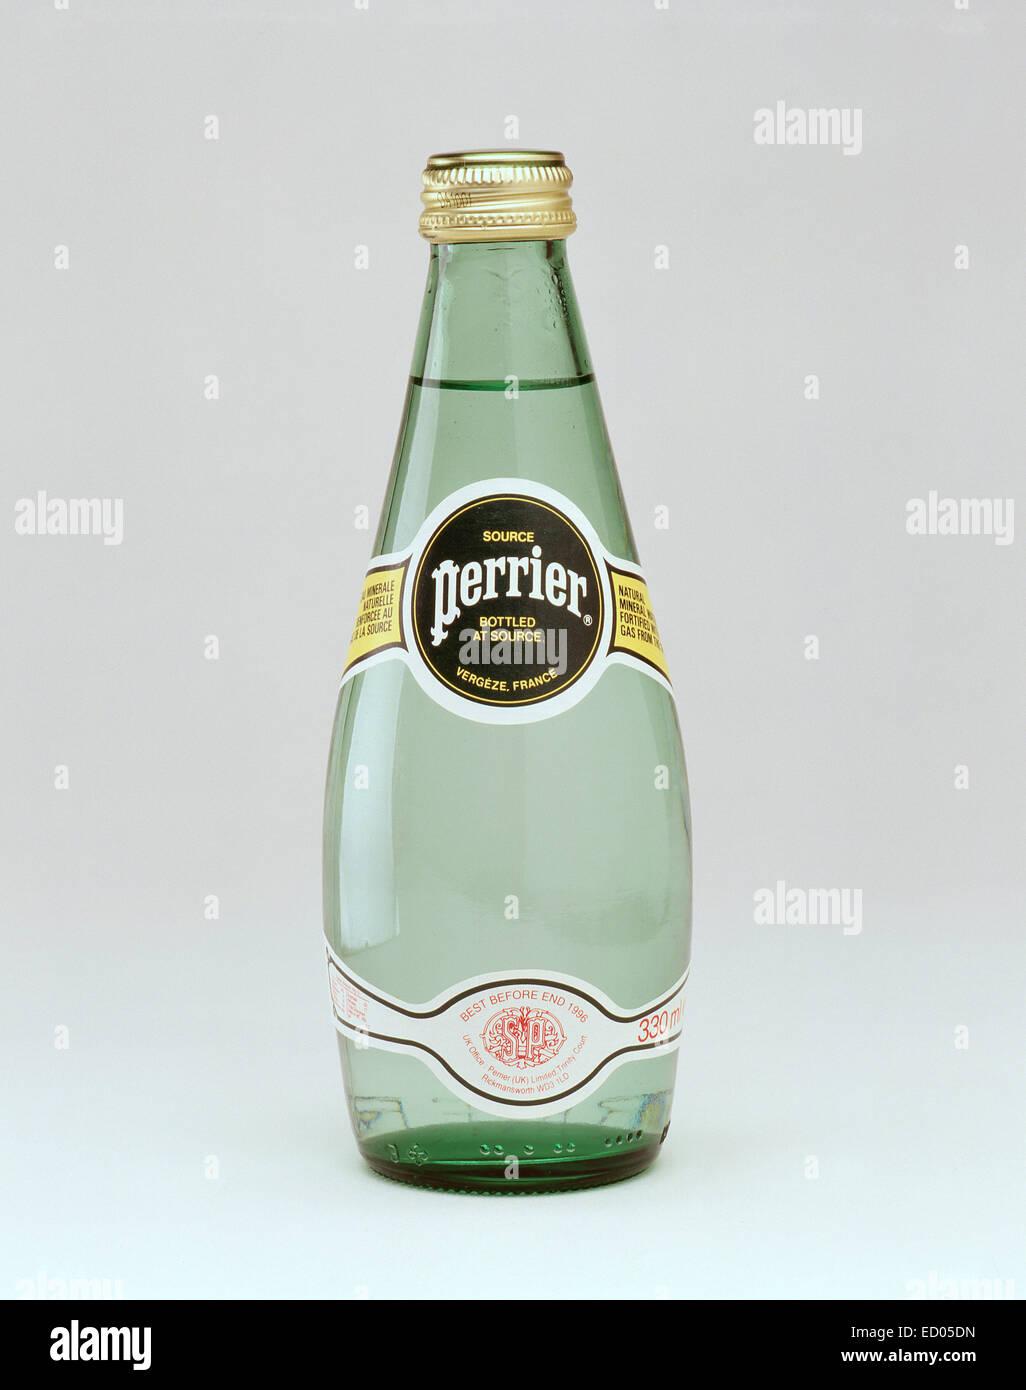 Bottle of Perrier (still life), Berkshire, England, United Kingdom - Stock Image